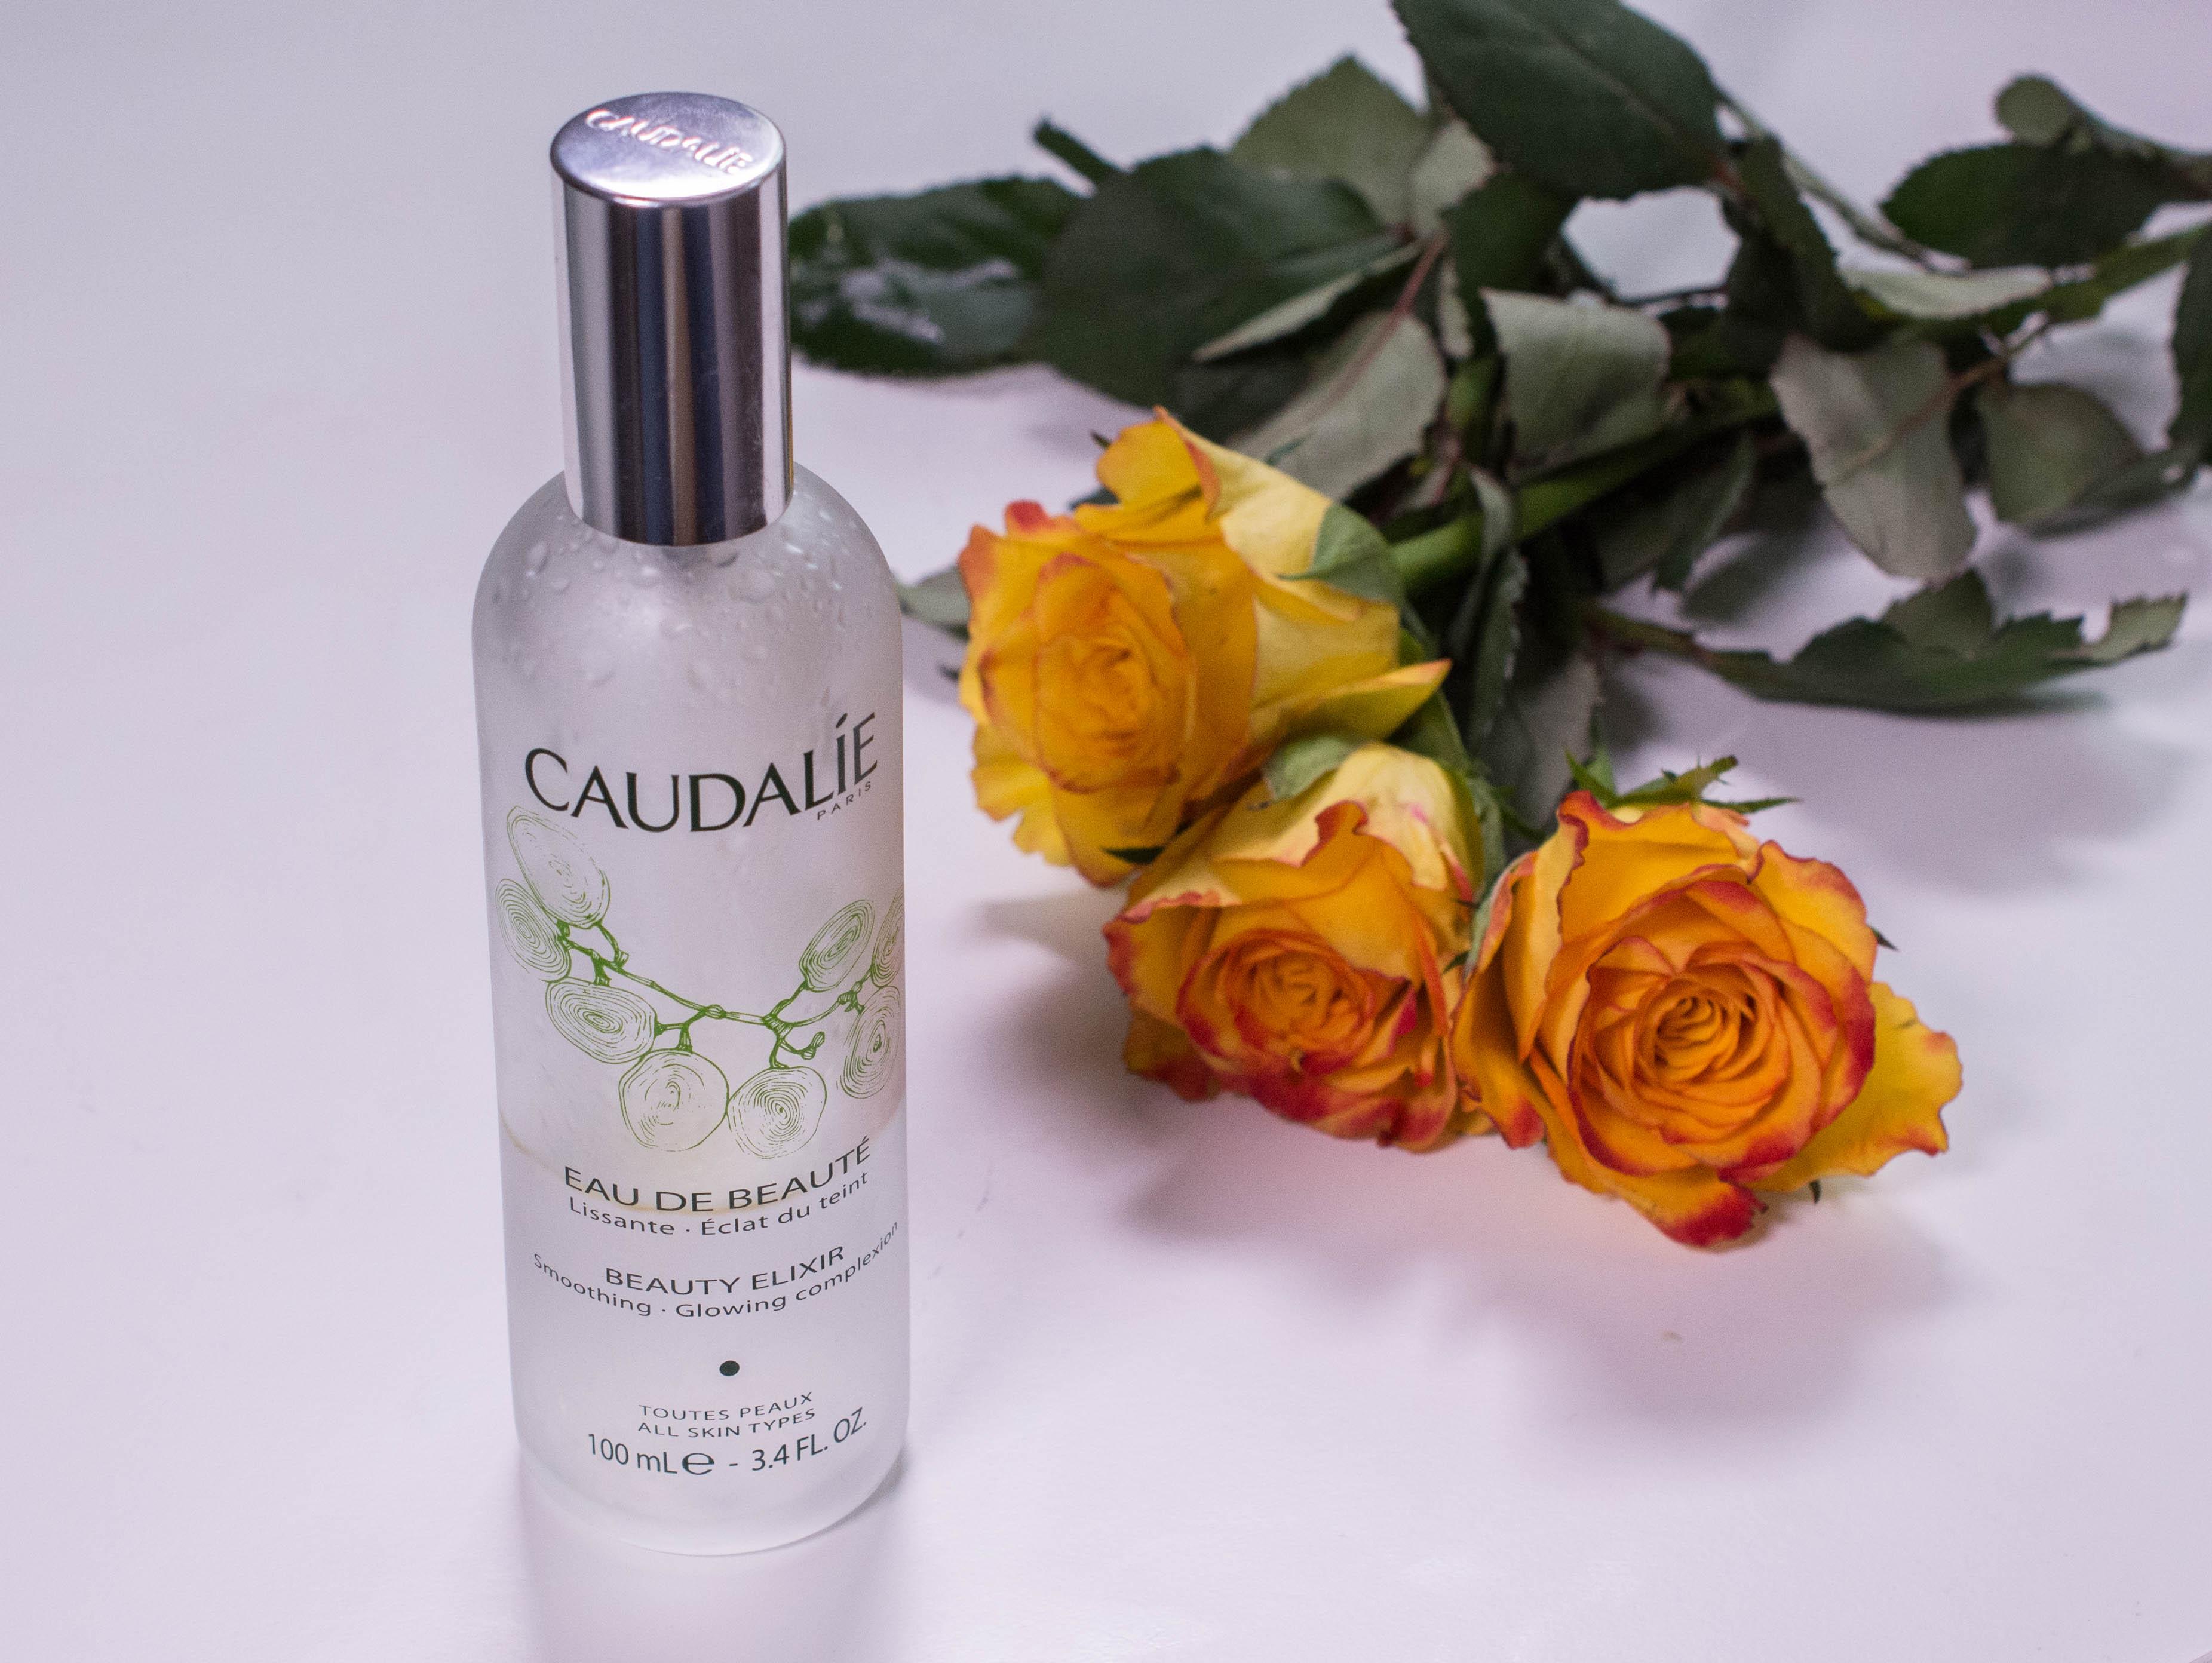 Caudalie Beauty Elixier (1 von 2)